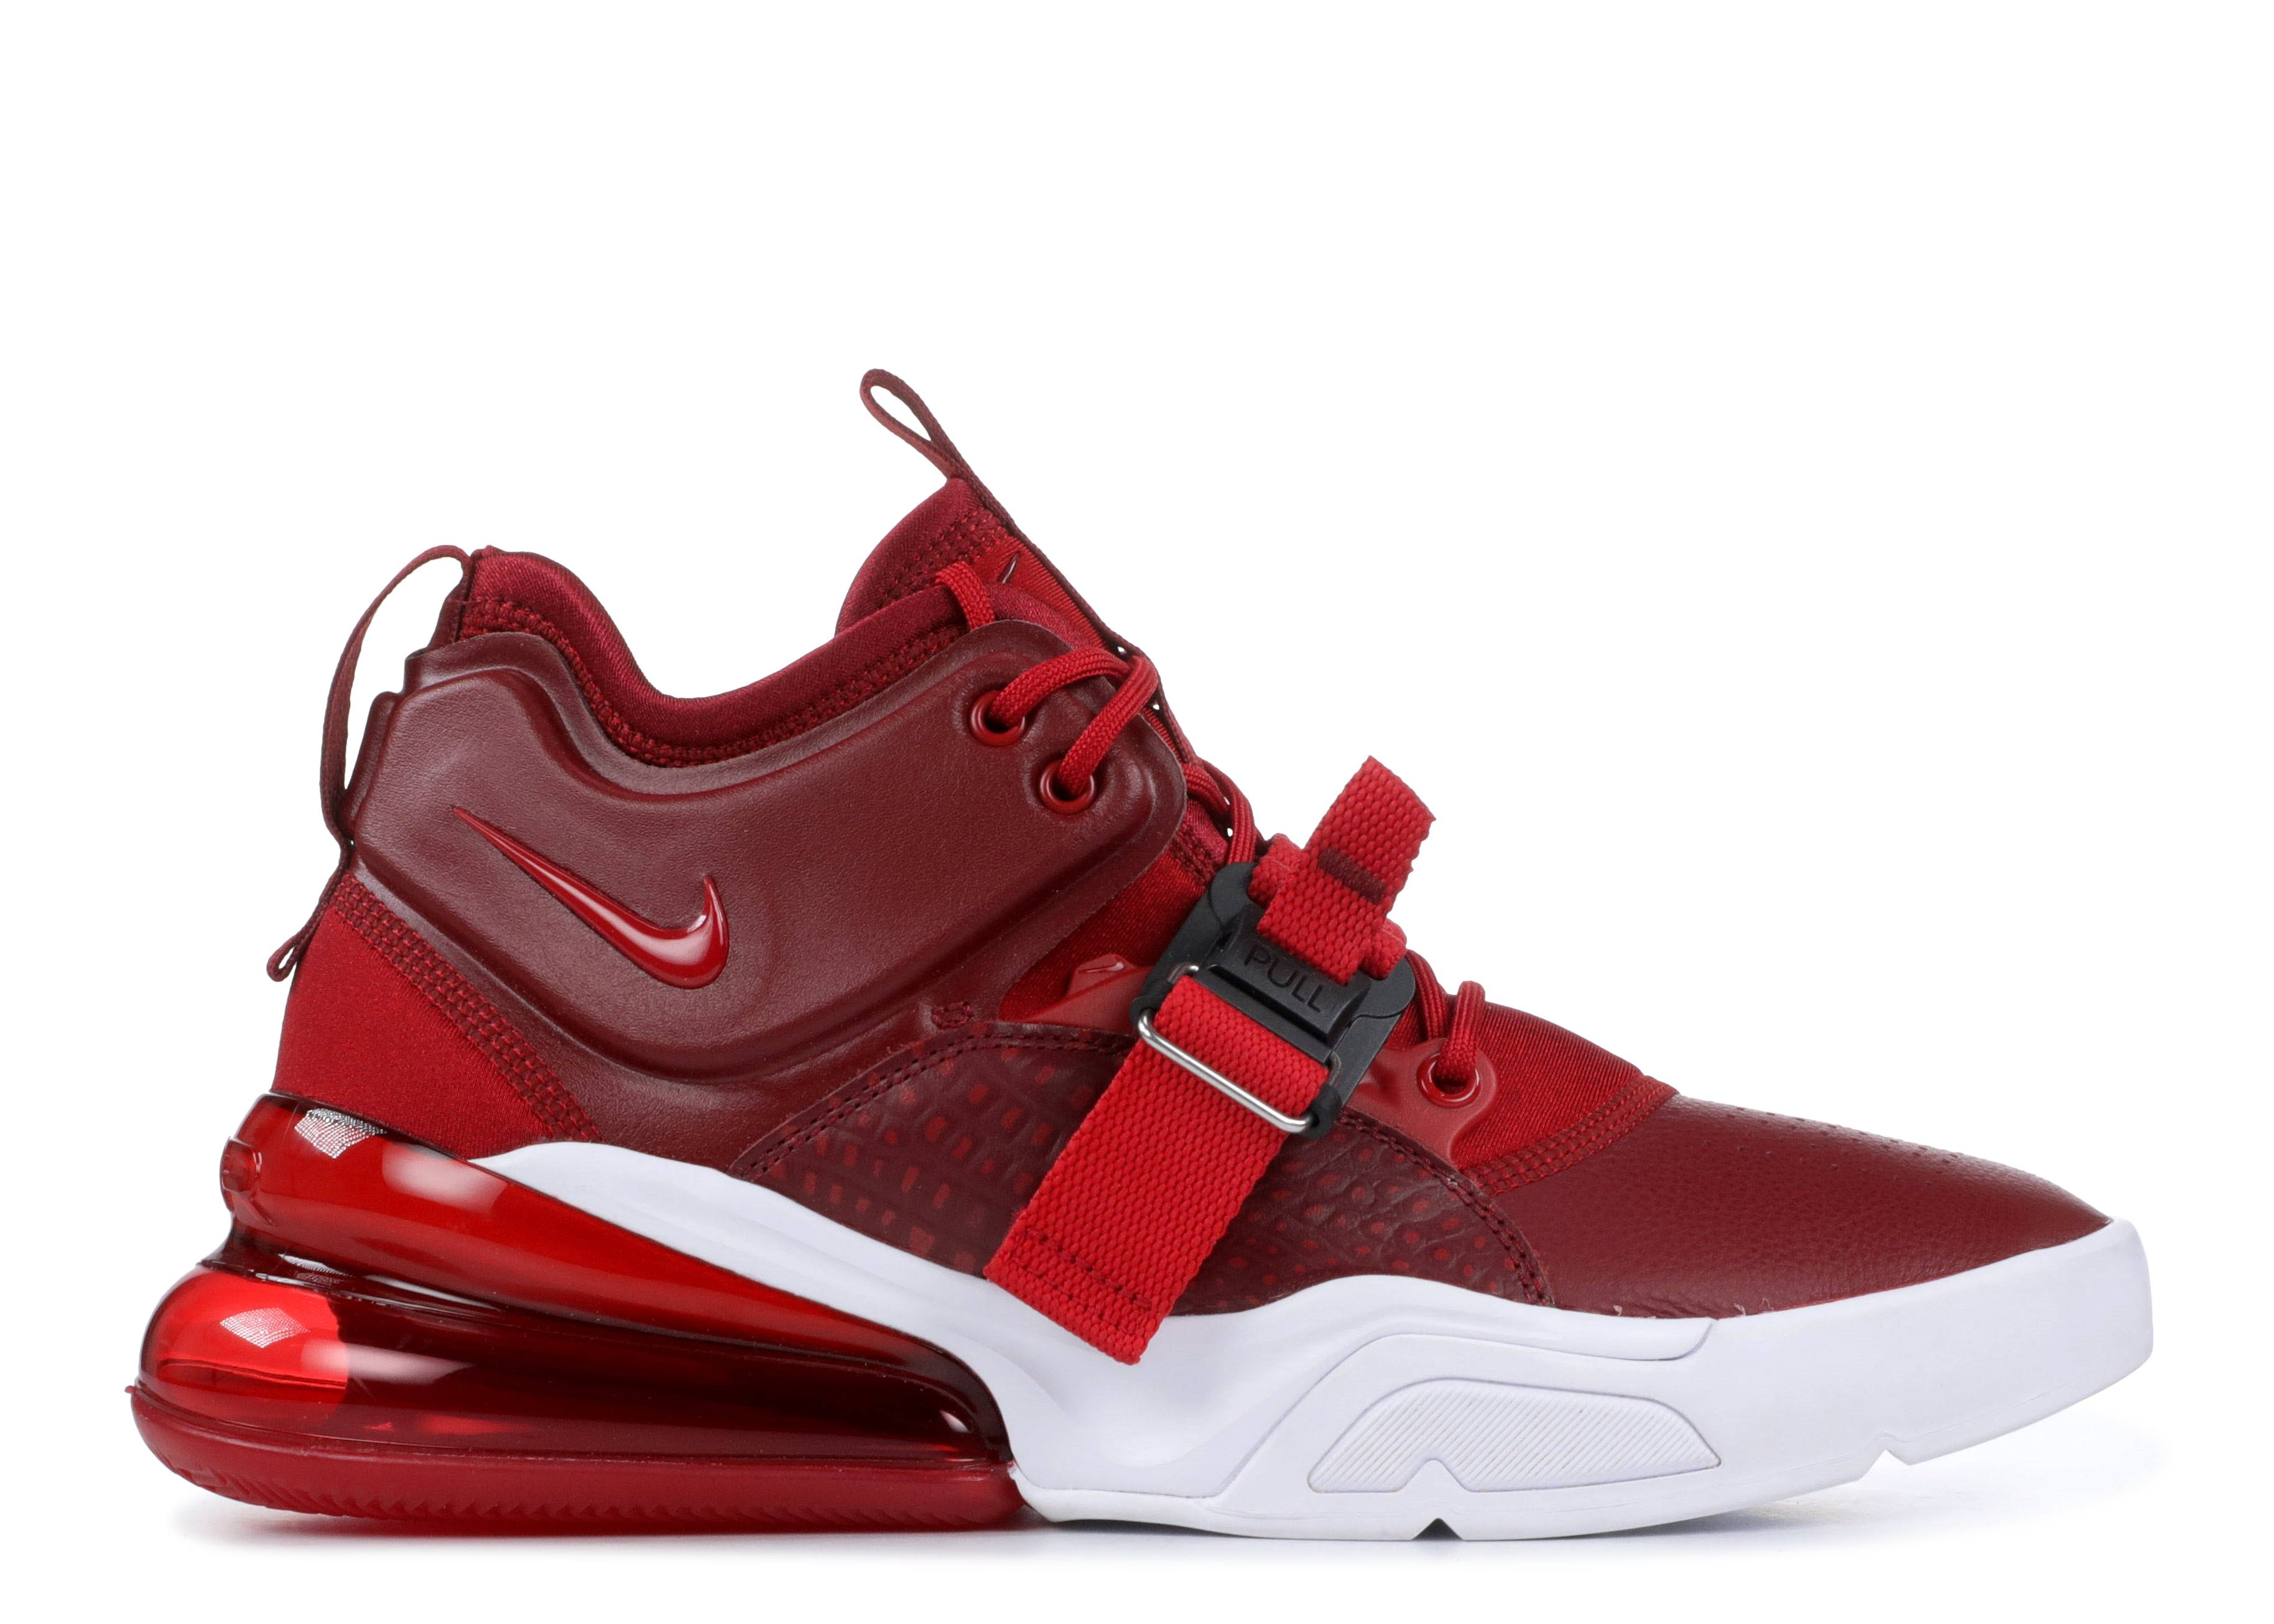 Nike Air Force 270 red Croc Nike ah6772 600 team red